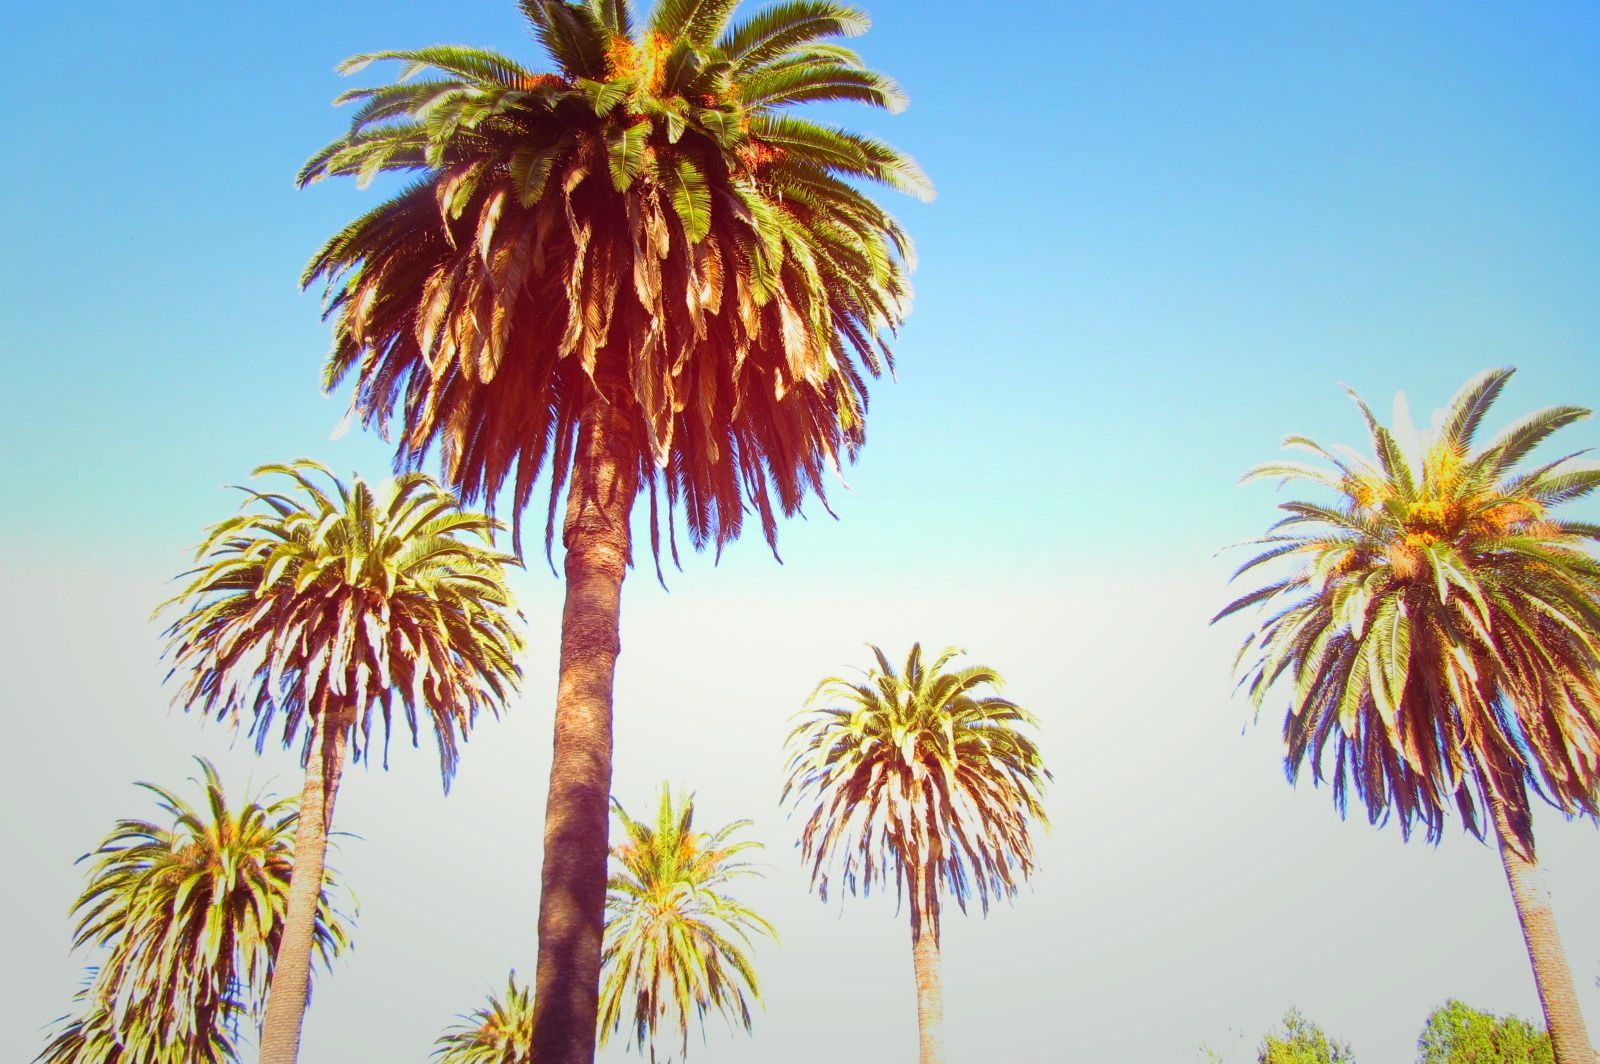 #Palms #LosAngeles #sunnyday #energy #light